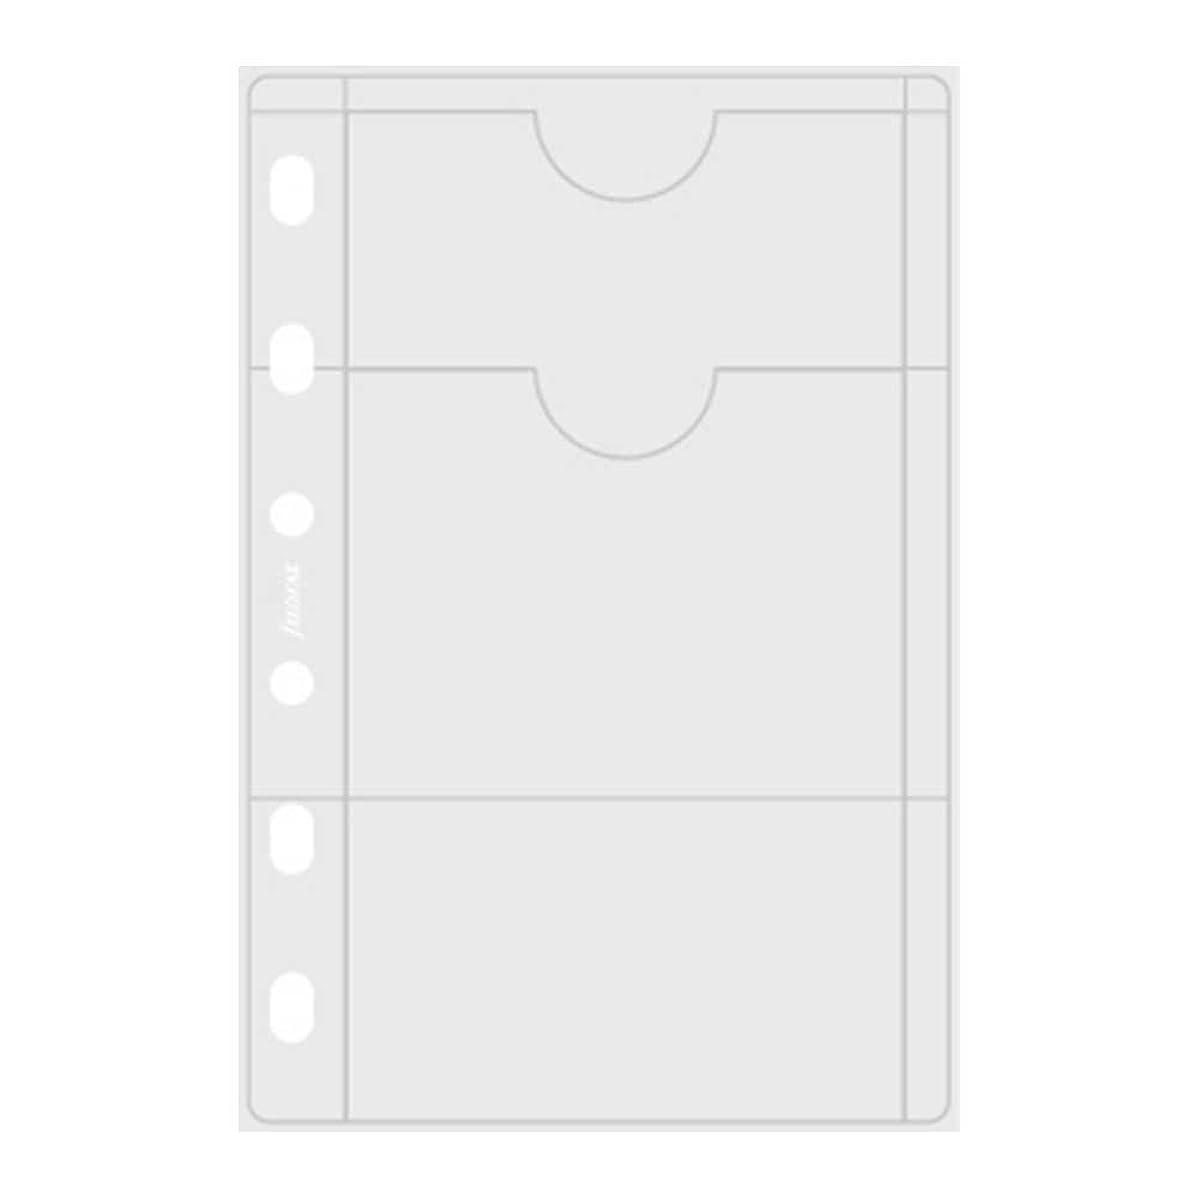 Filofax Pocket Credit Card Holder (B213603)